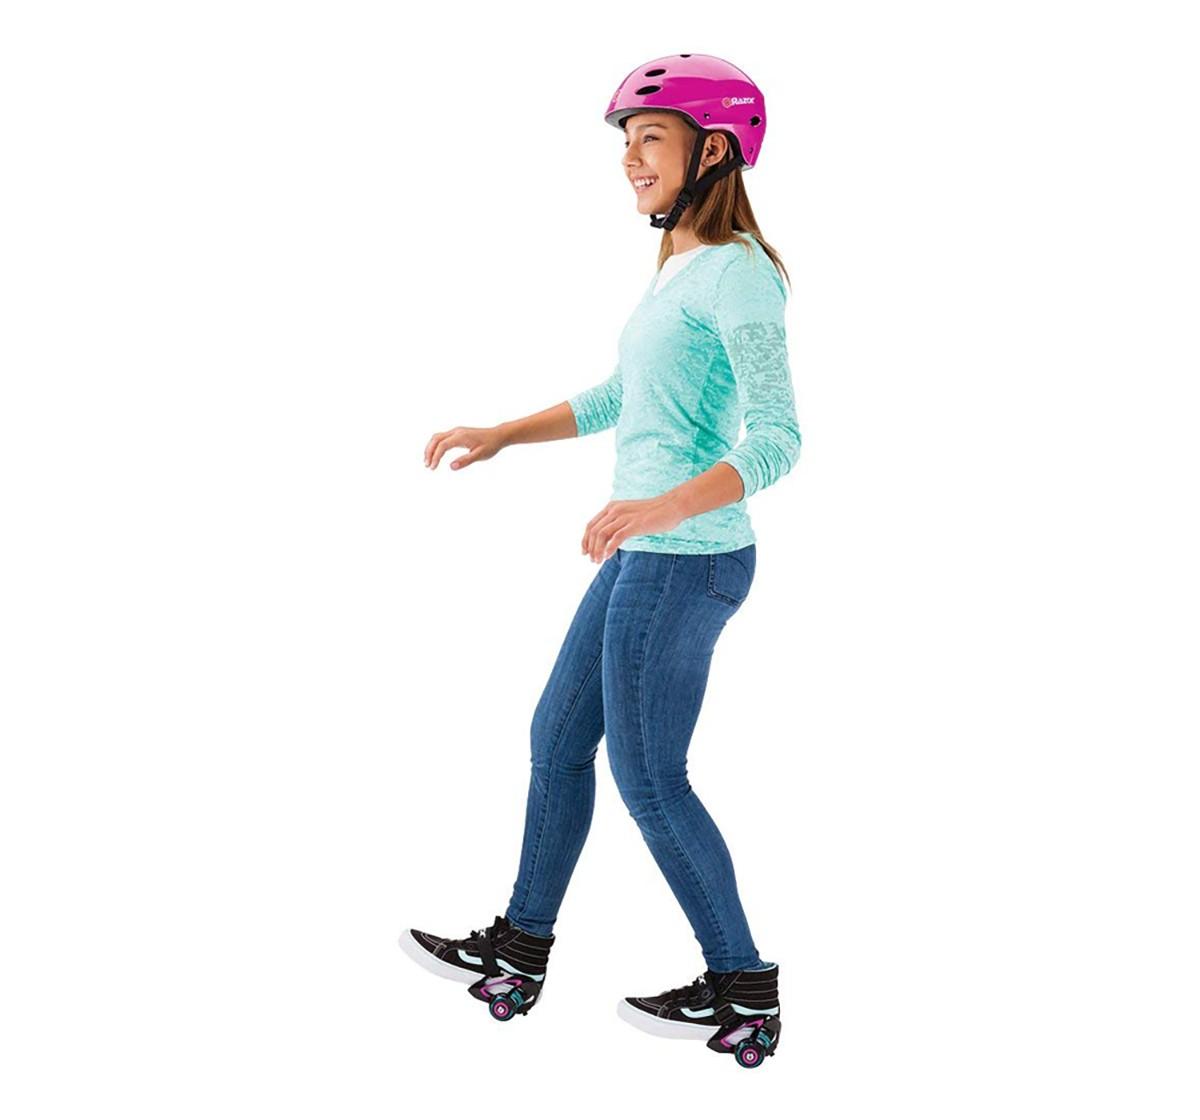 Razor 25056150 Jetts Heel Wheels, One Size (Purple) Skates and Skateboards for Kids age 8Y+ (Purple)